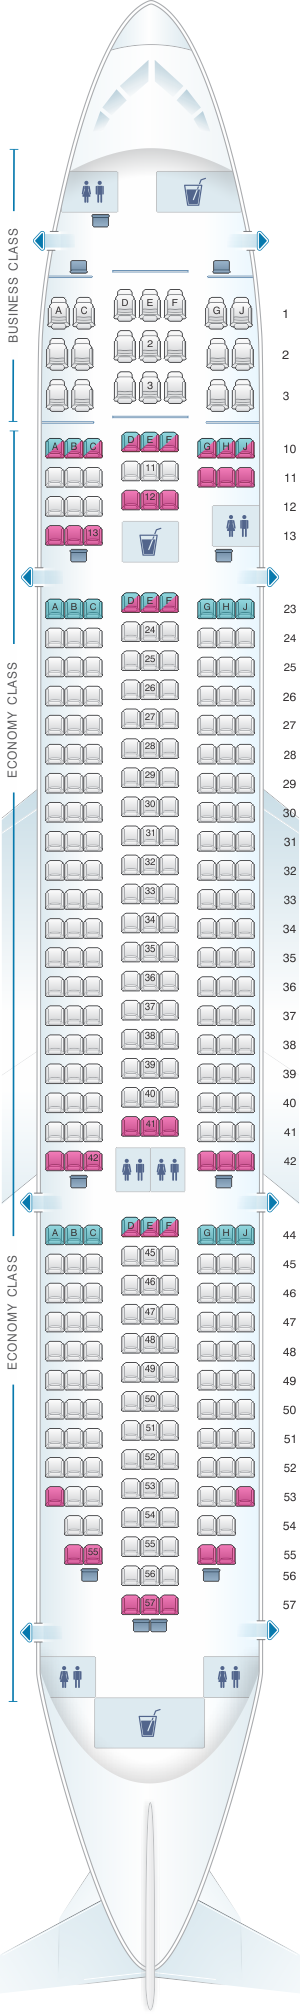 seat map jetstar airways boeing 787 8 dreamliner seatmaestro